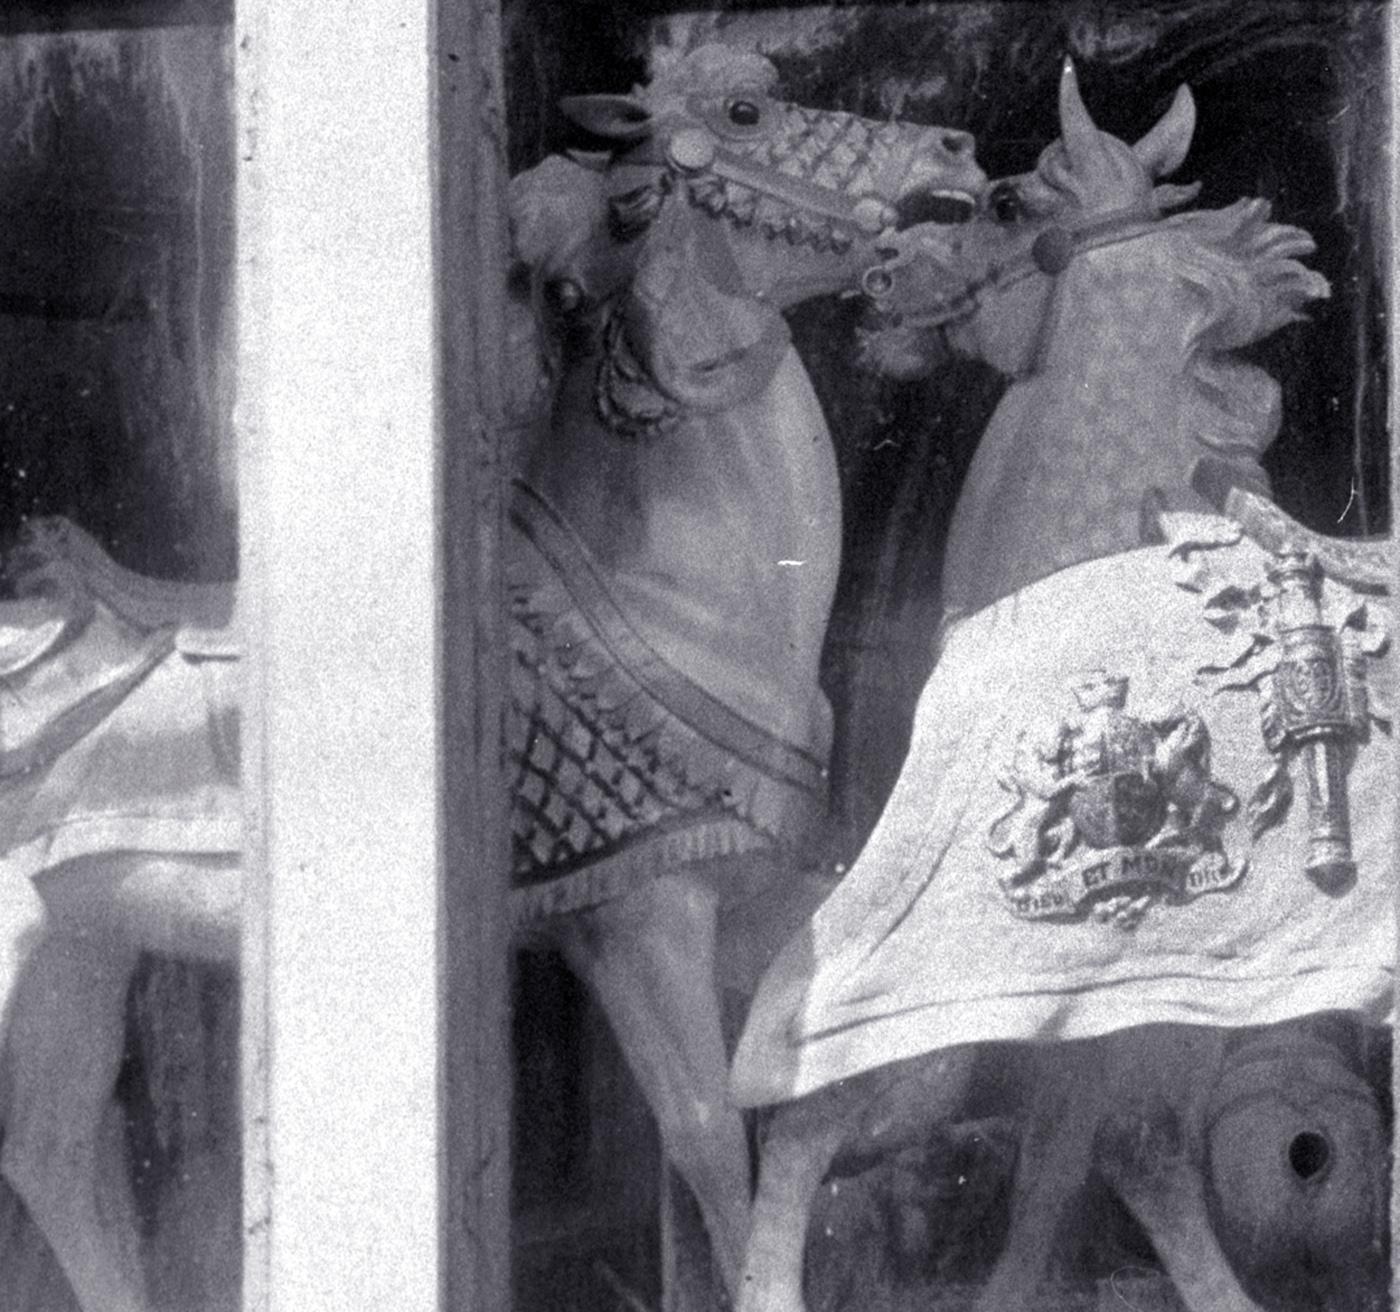 D-C-Muller-shop-window-close-center-ca-1910